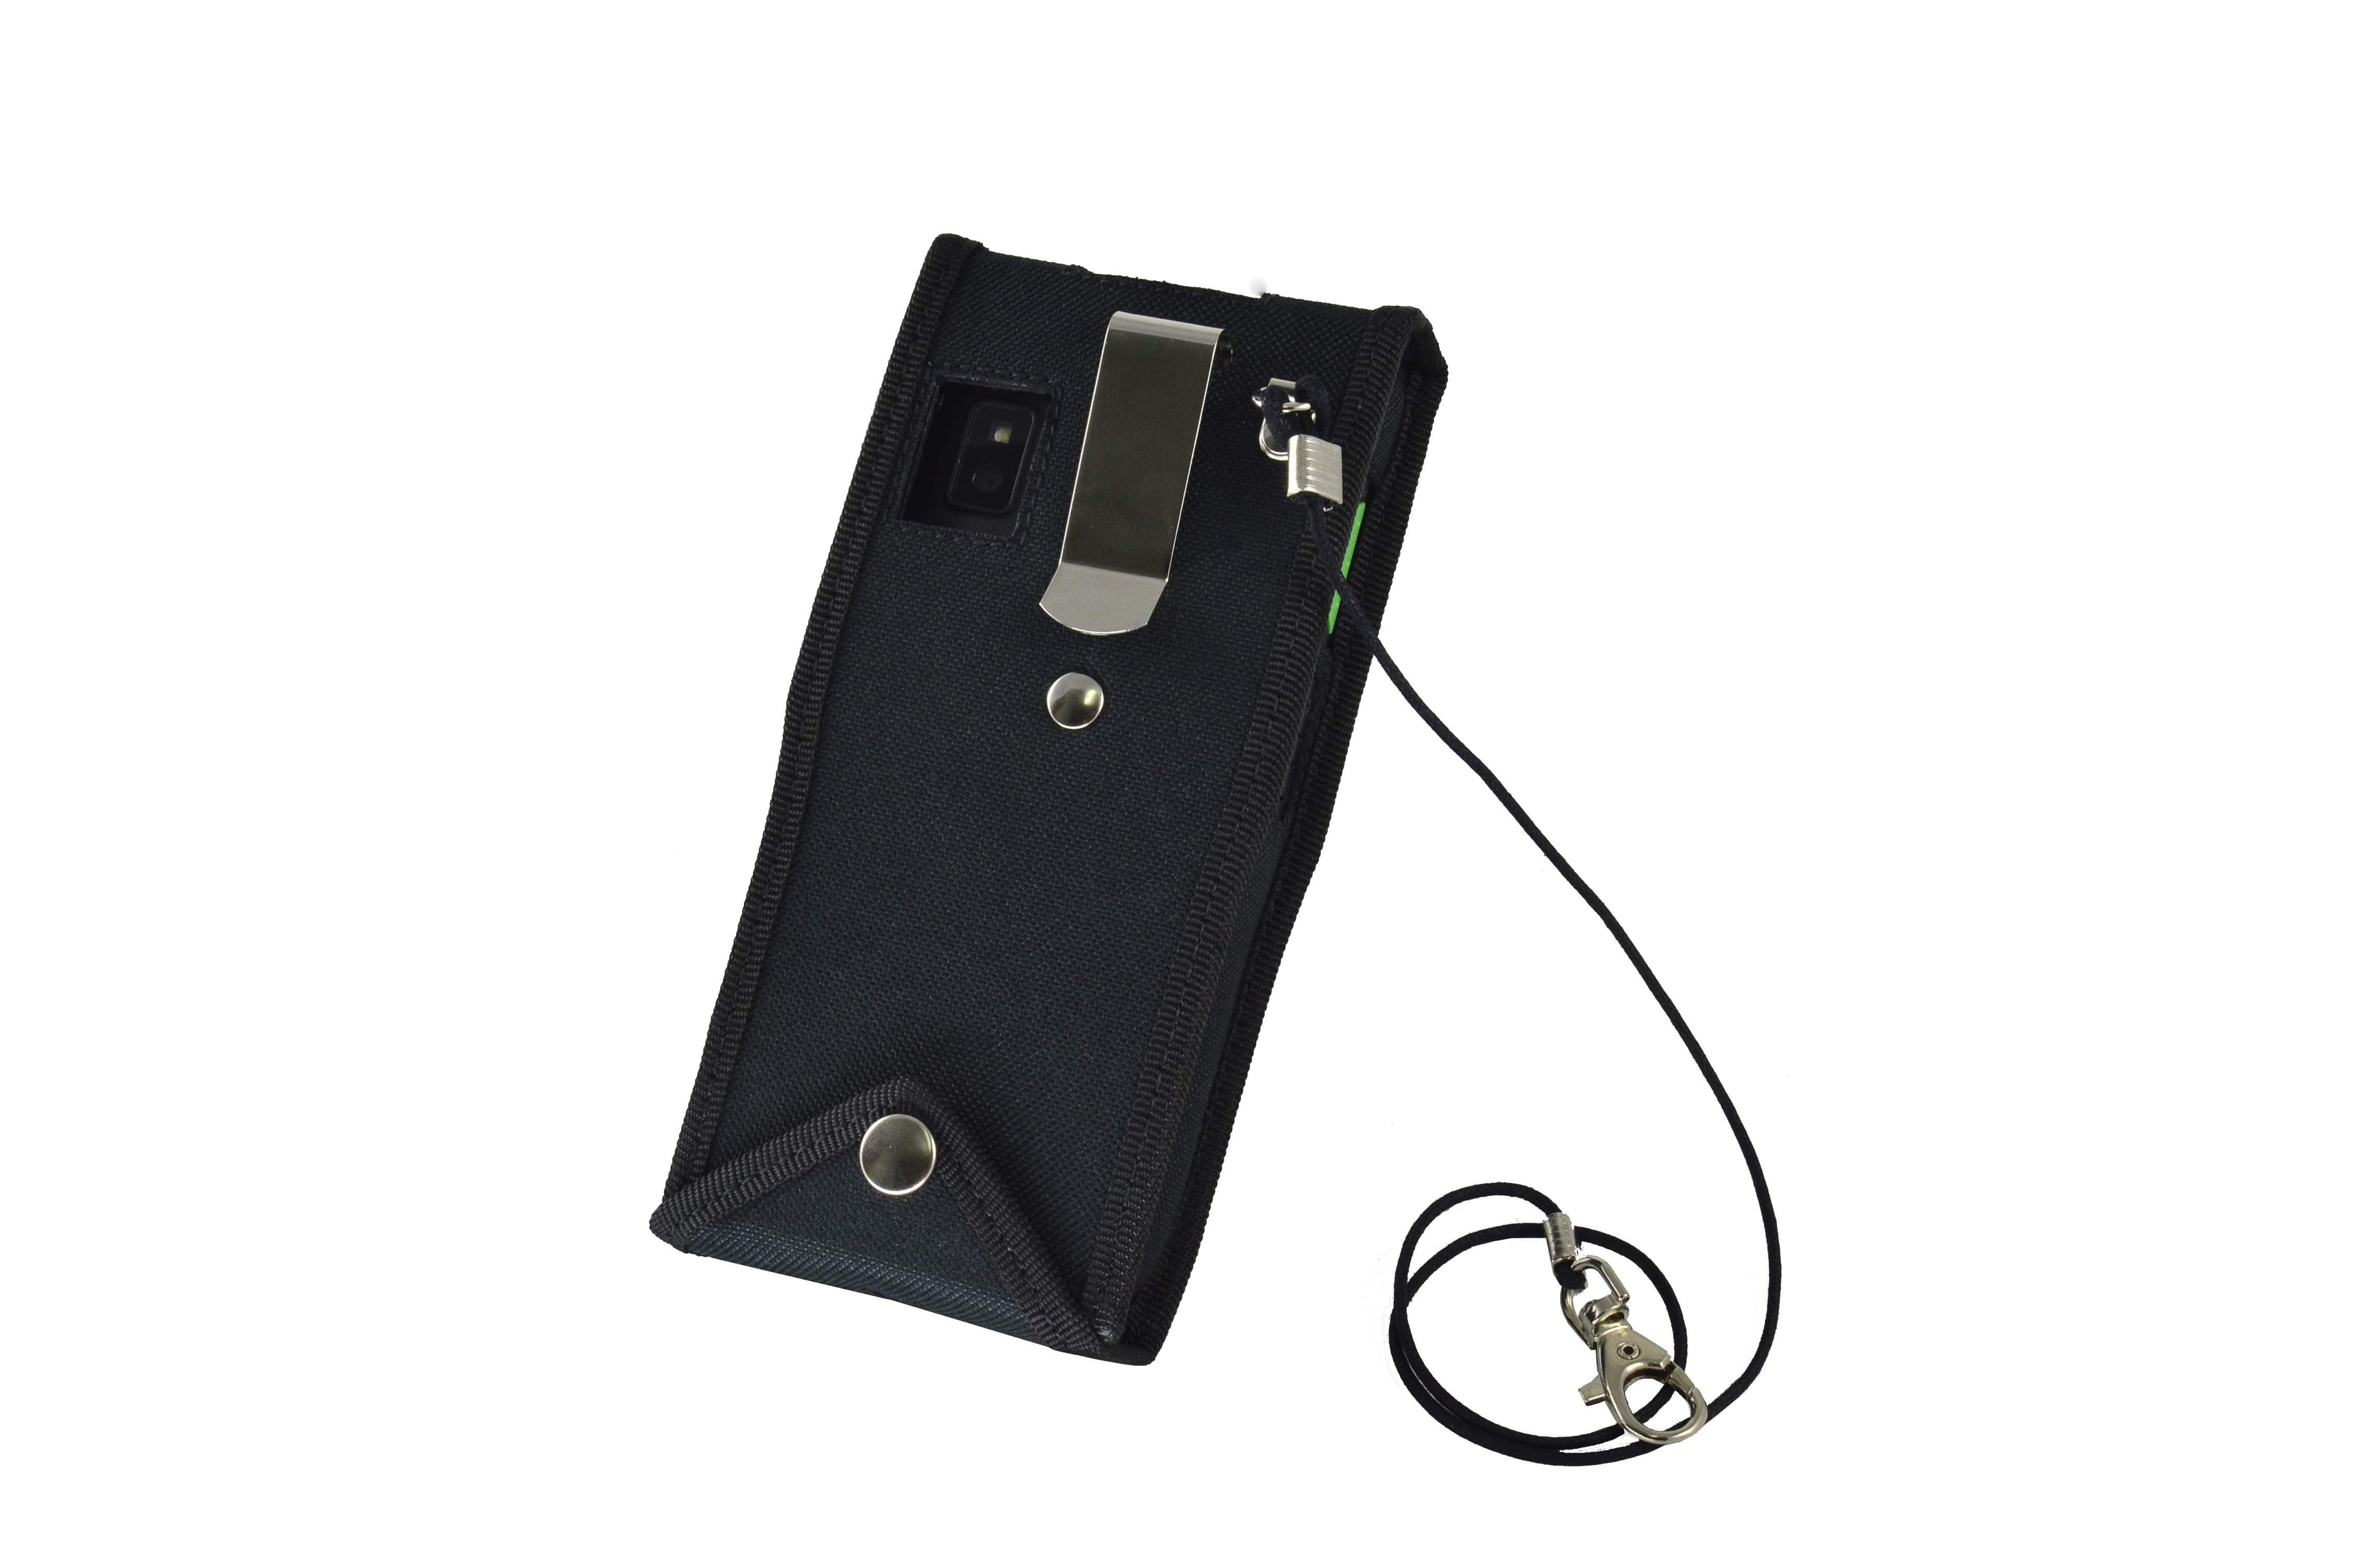 Honeywell ScanPal EDA 50K case rear view metalic belt clip